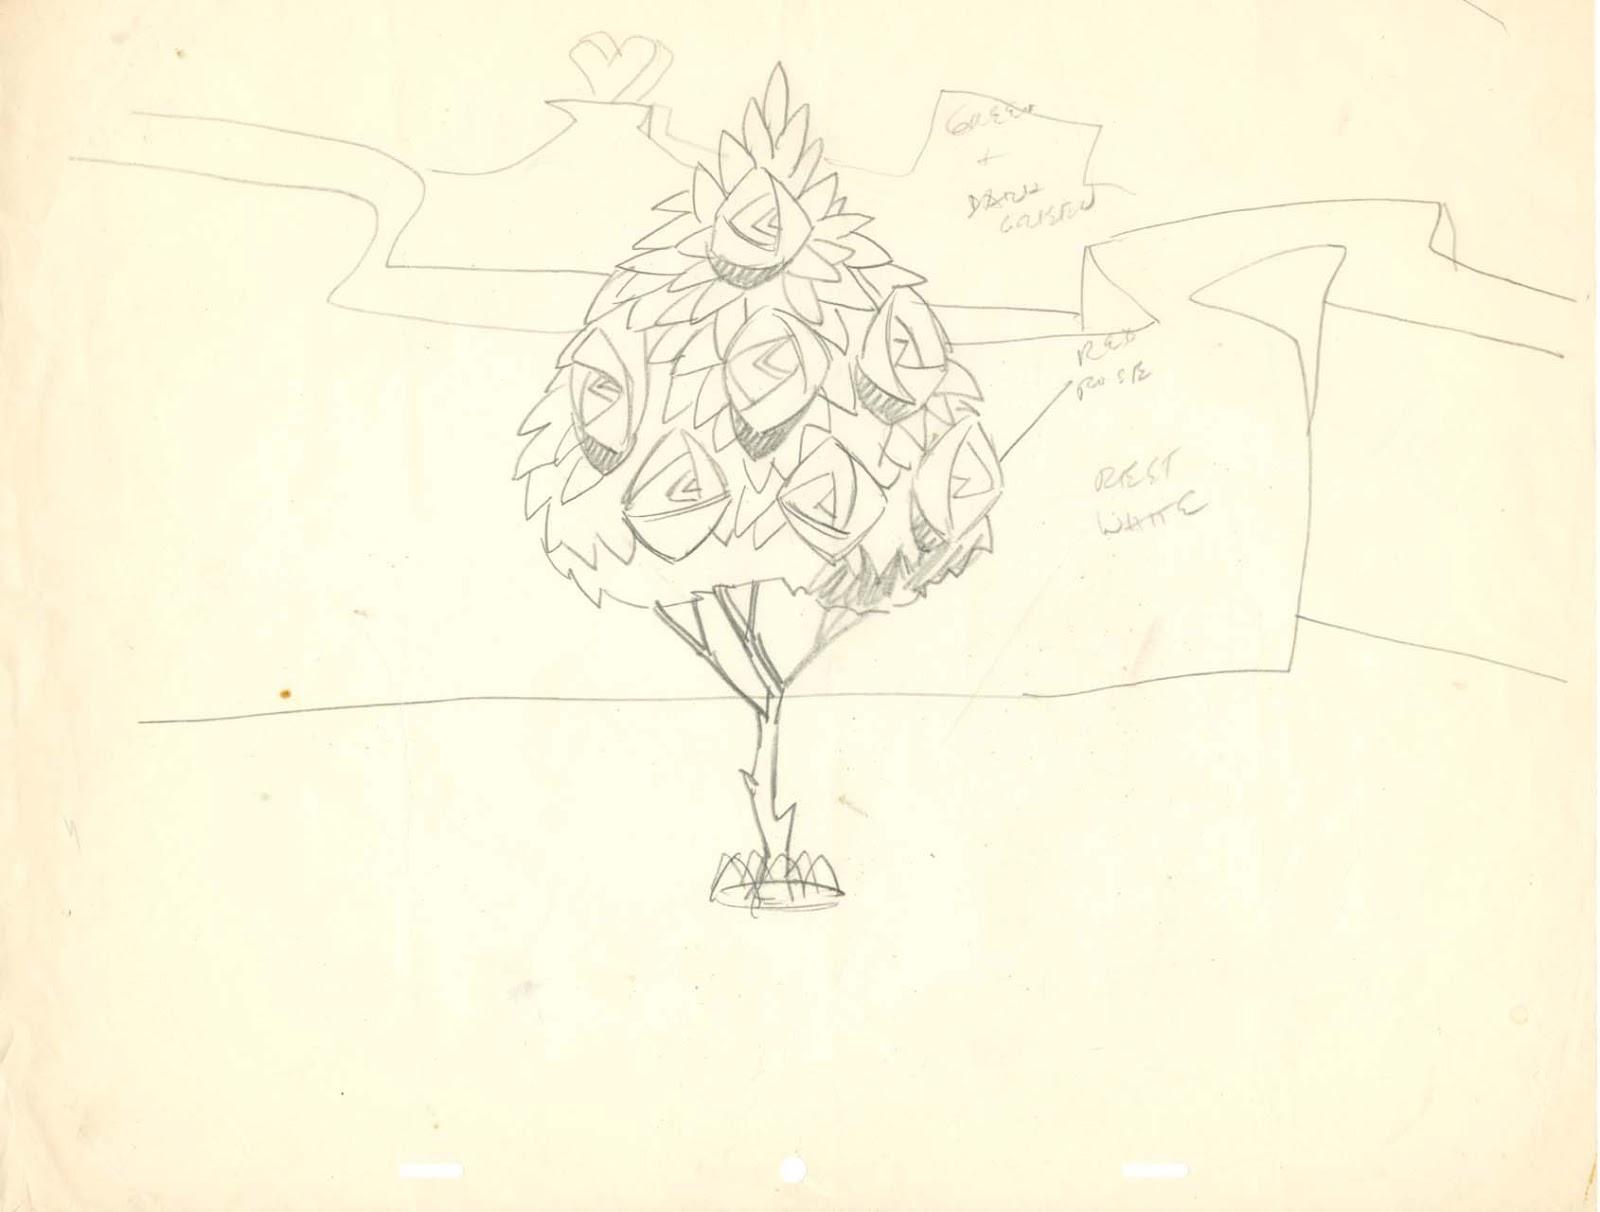 Drawn rose alice in wonderland Image  drawing layout drawing